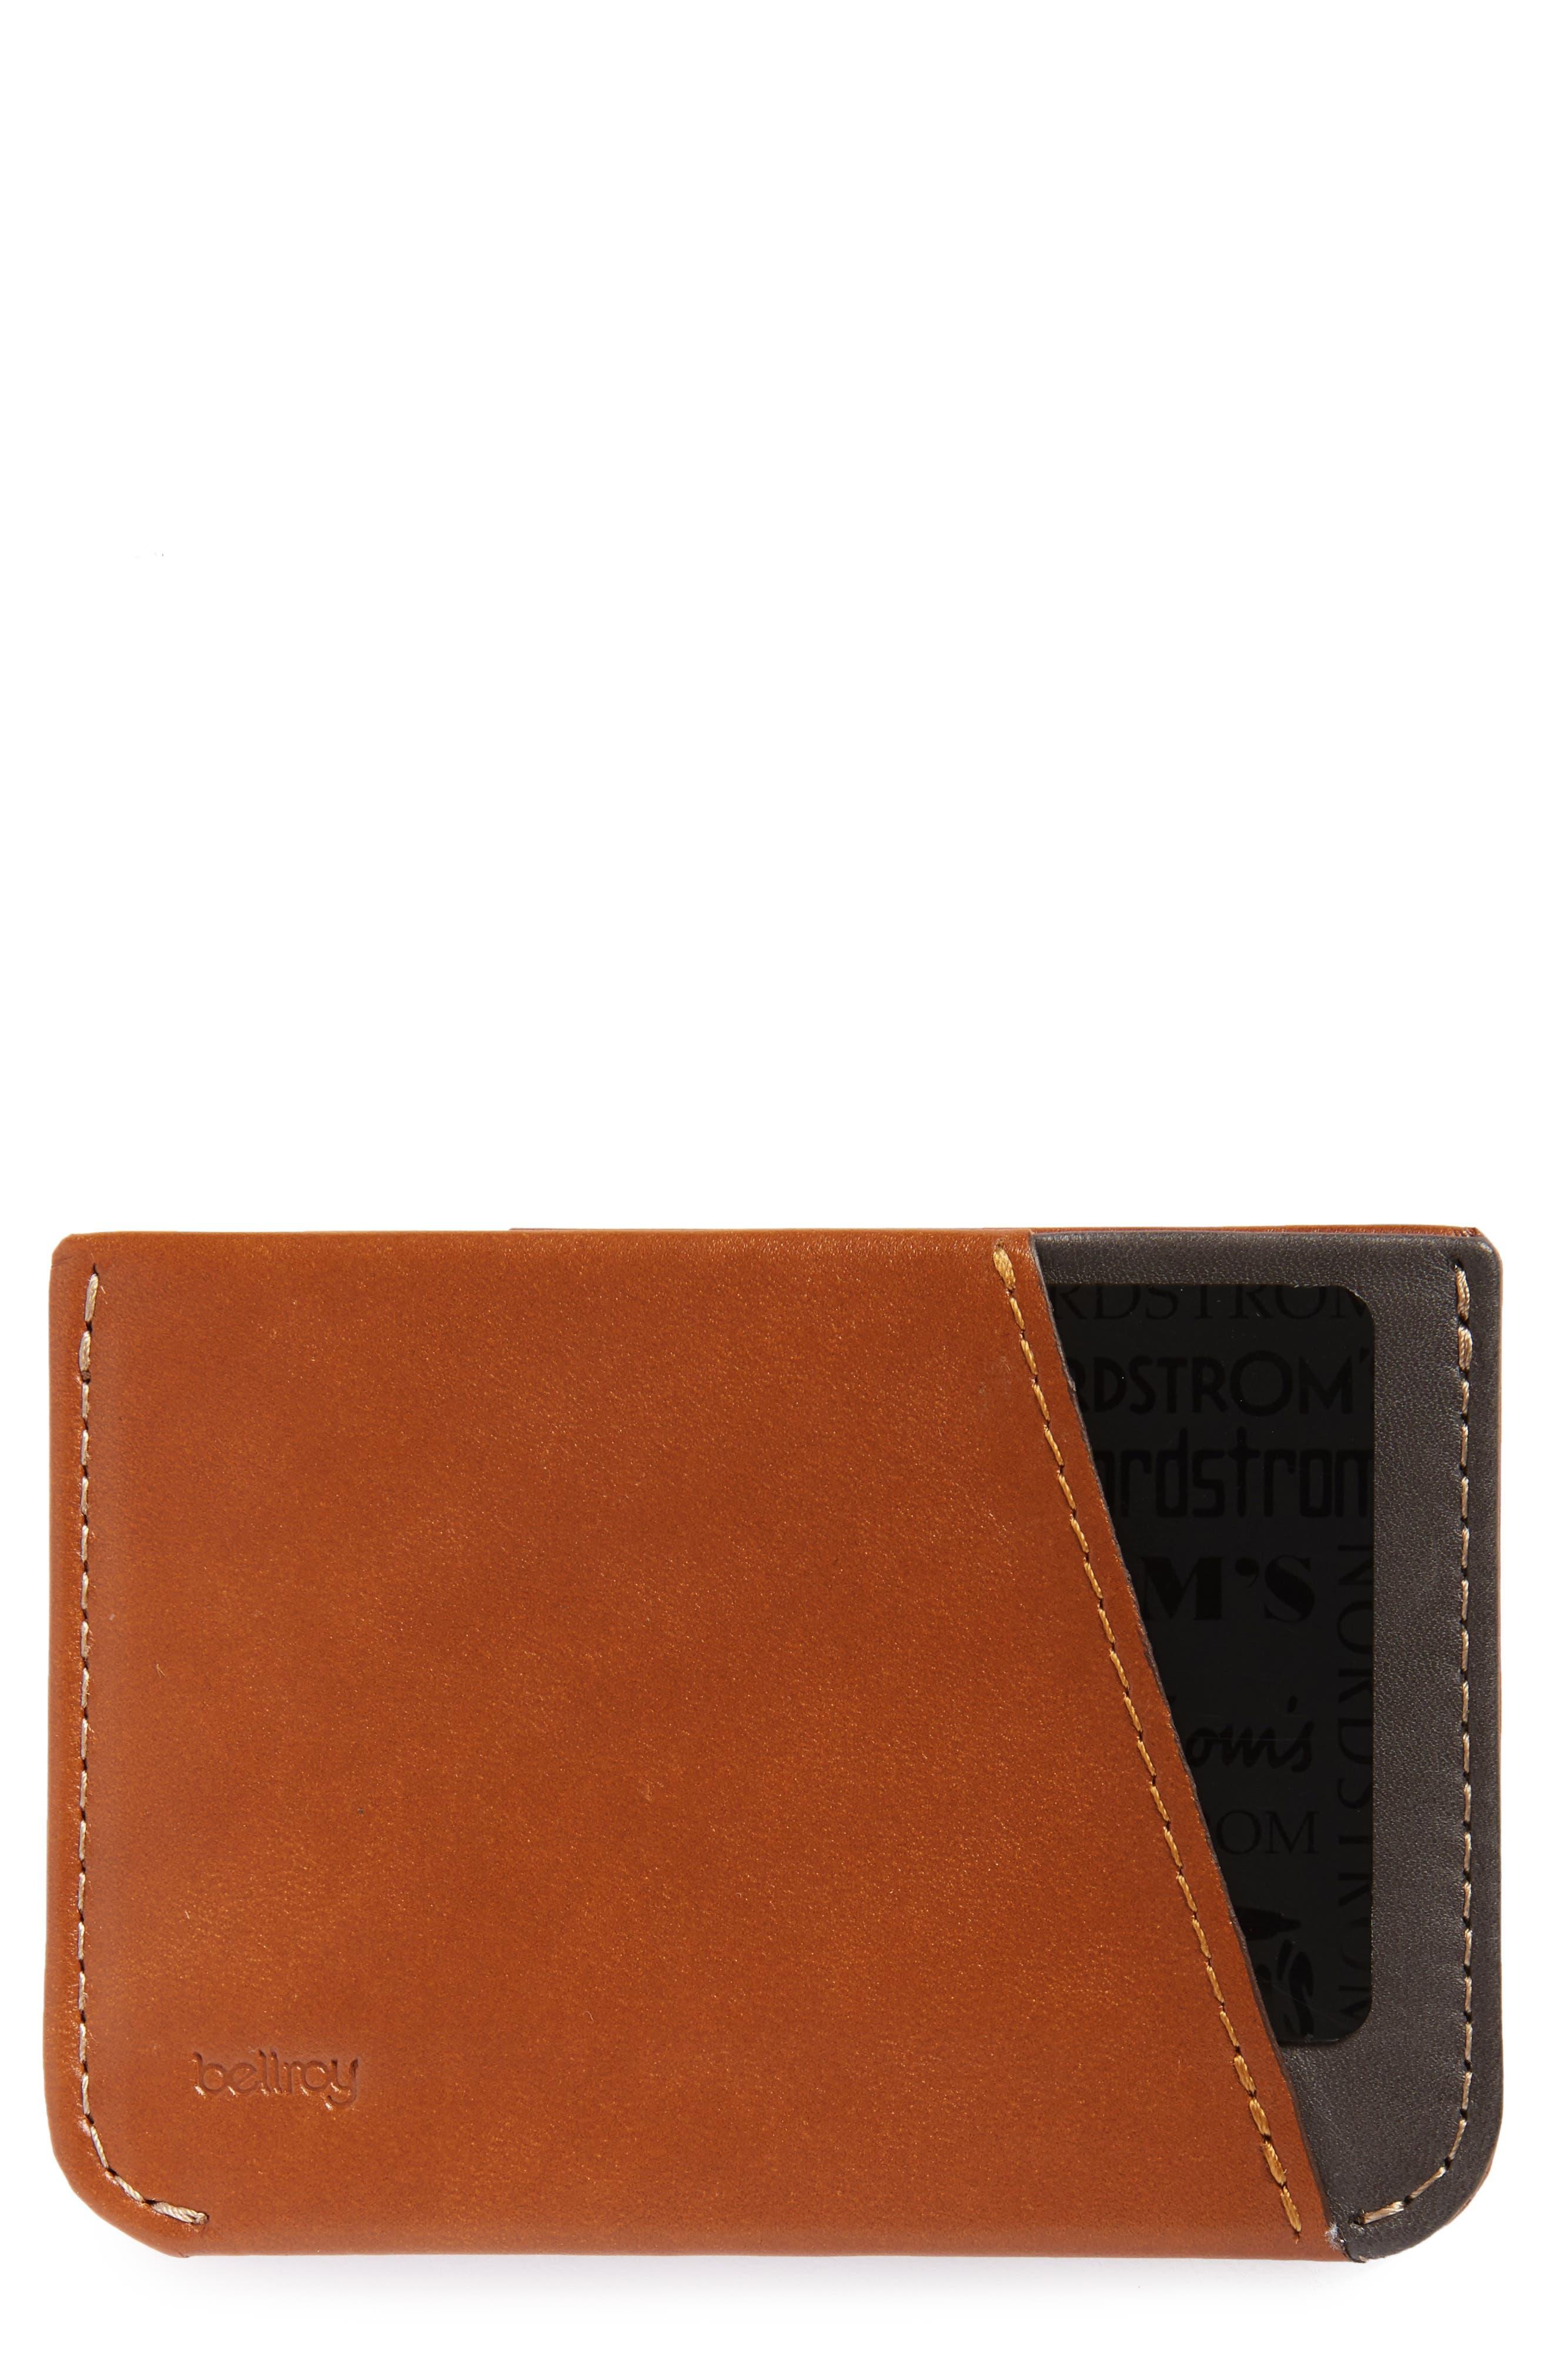 Bellroy Micro Sleeve Card Case